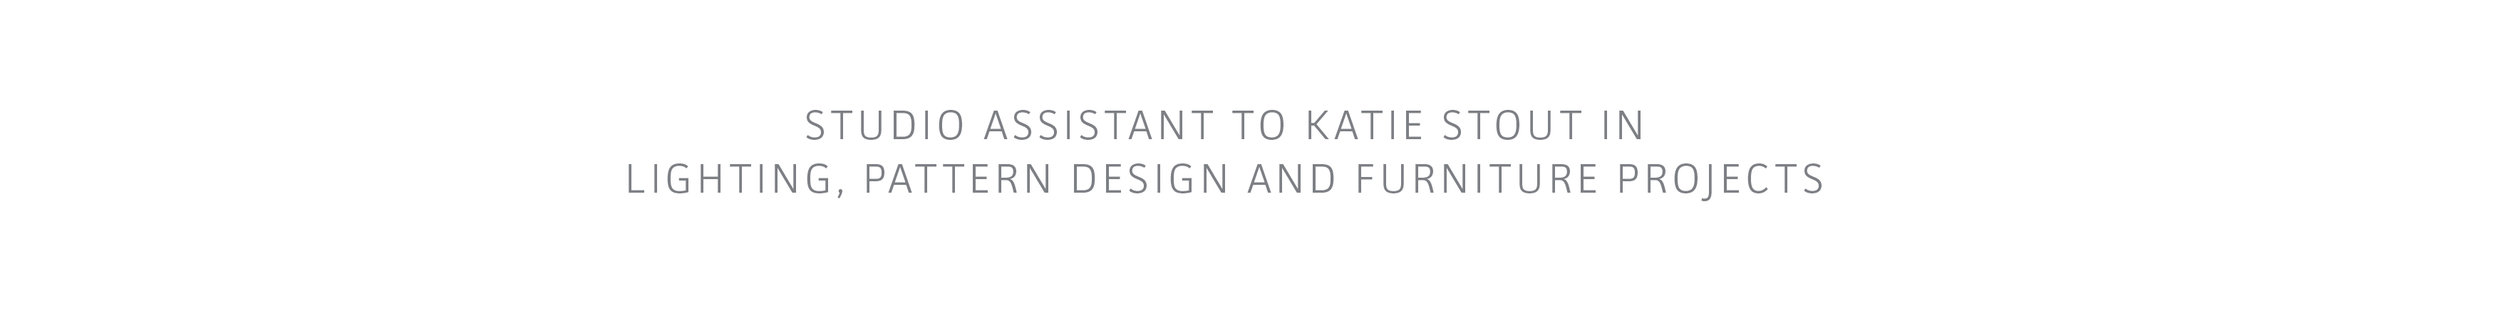 Katie Stout Website title page.jpg